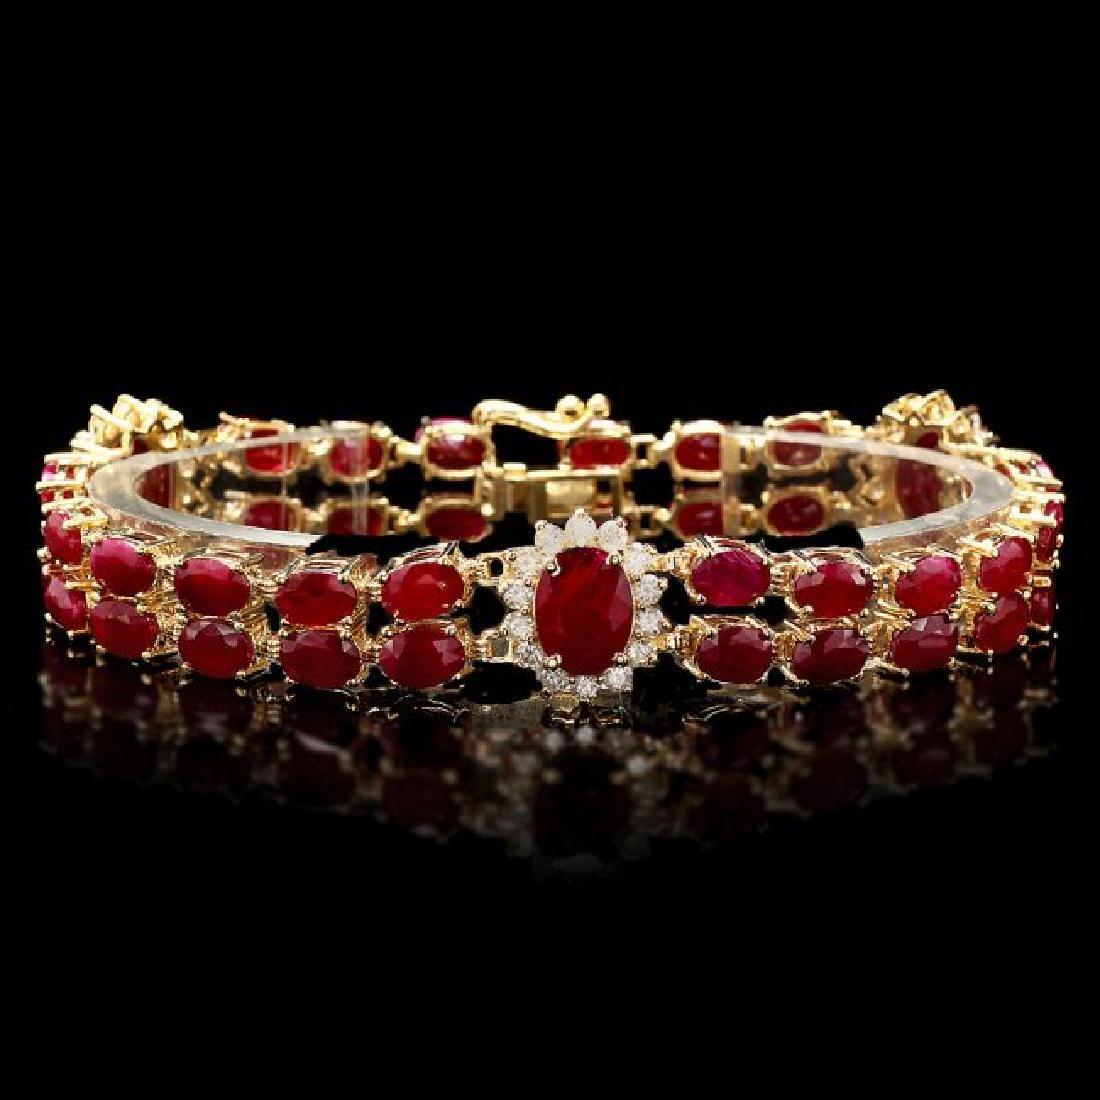 14k Gold 31.5ct Ruby 1.70ct Diamond Bracelet